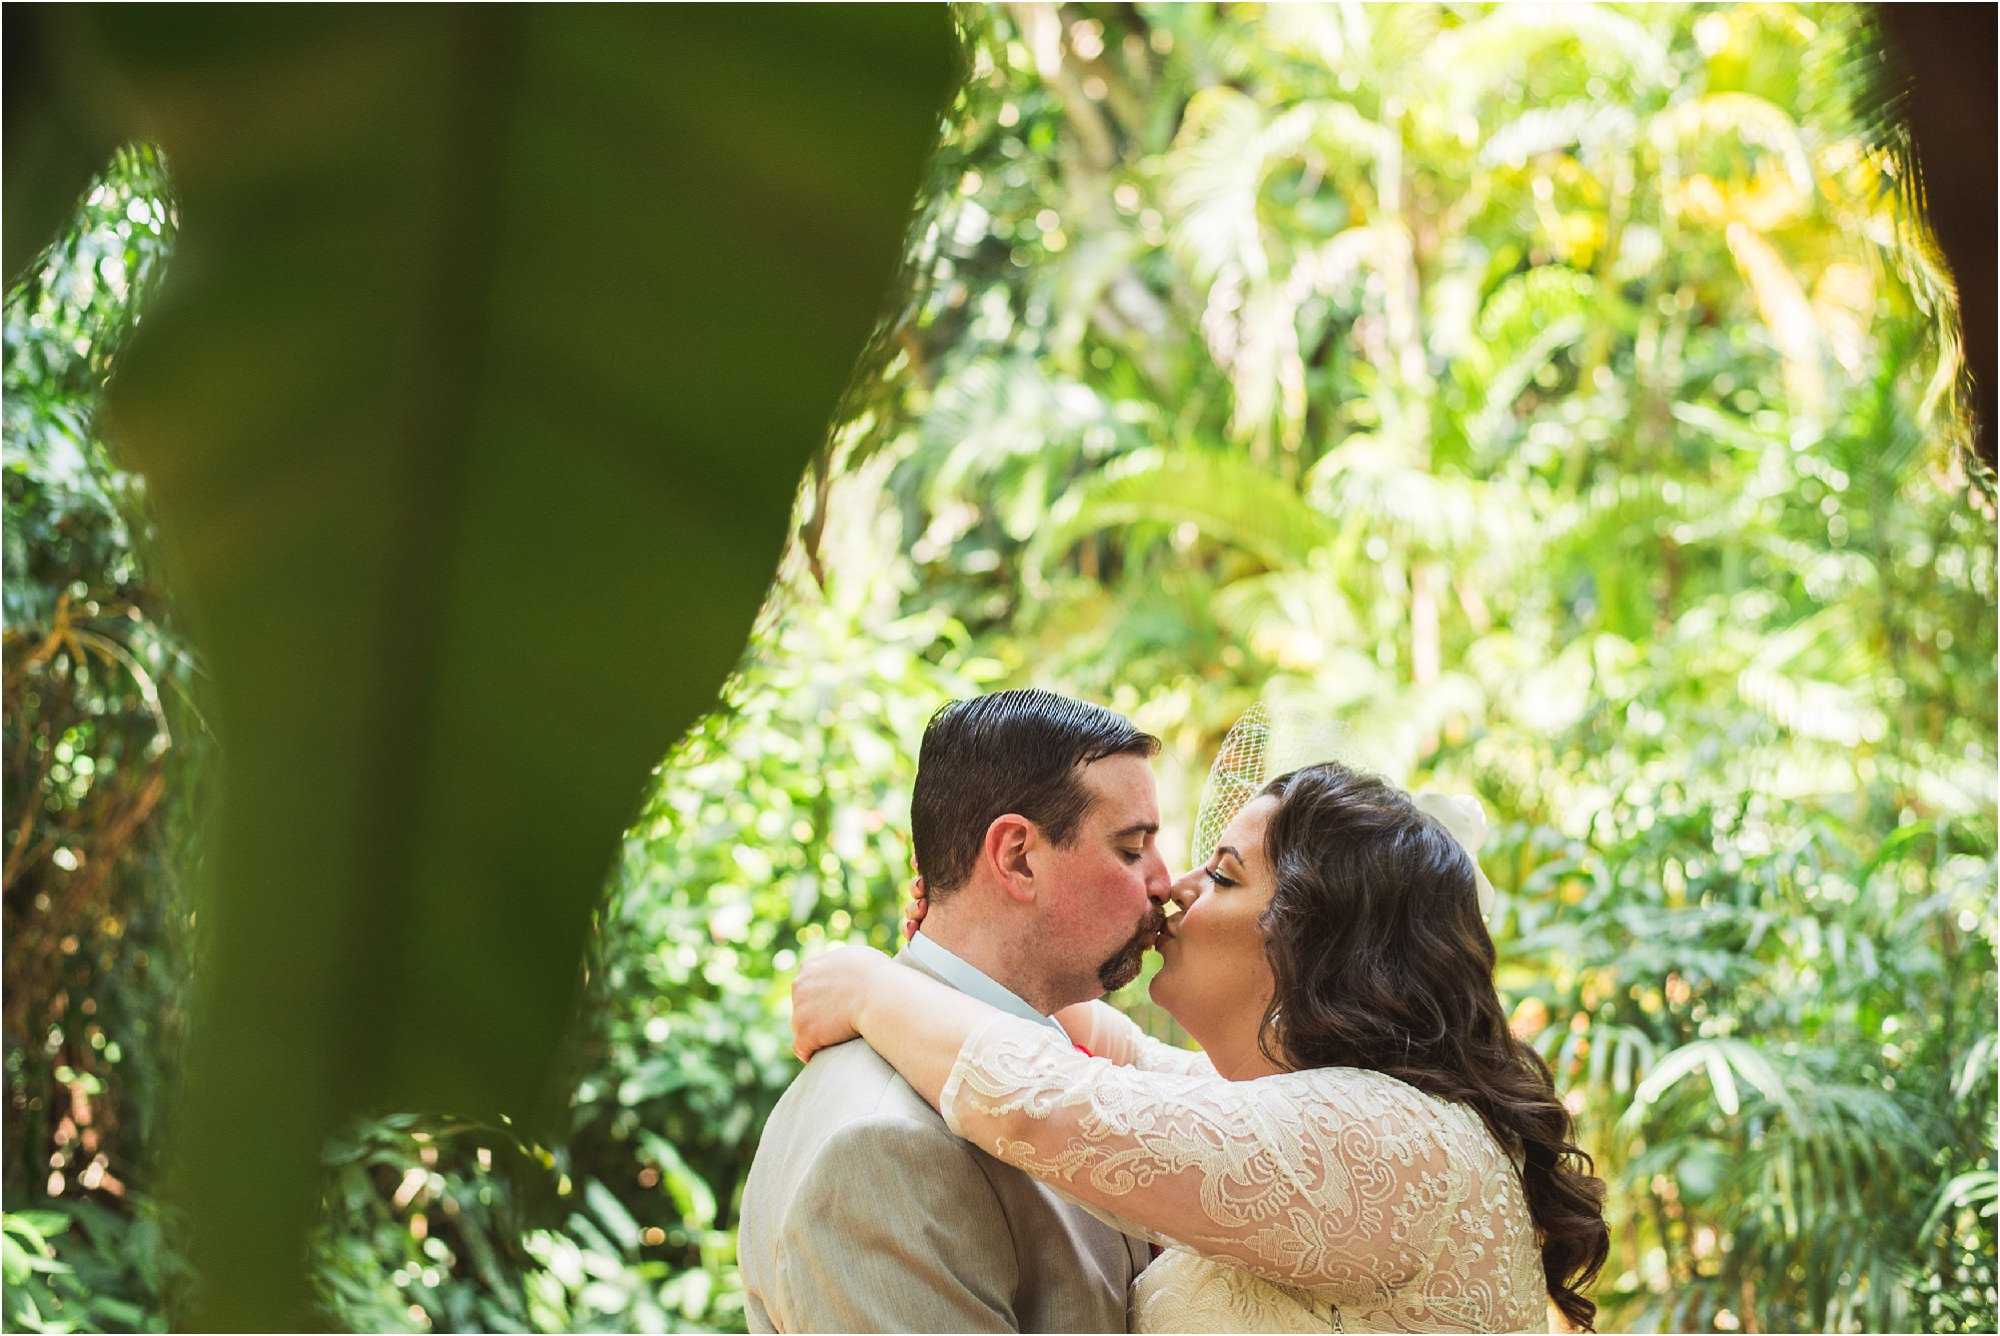 outdoor-rustic-pincrest-gardens-wedding-miami-photographer-jessenia-gonzalez_1013.jpg